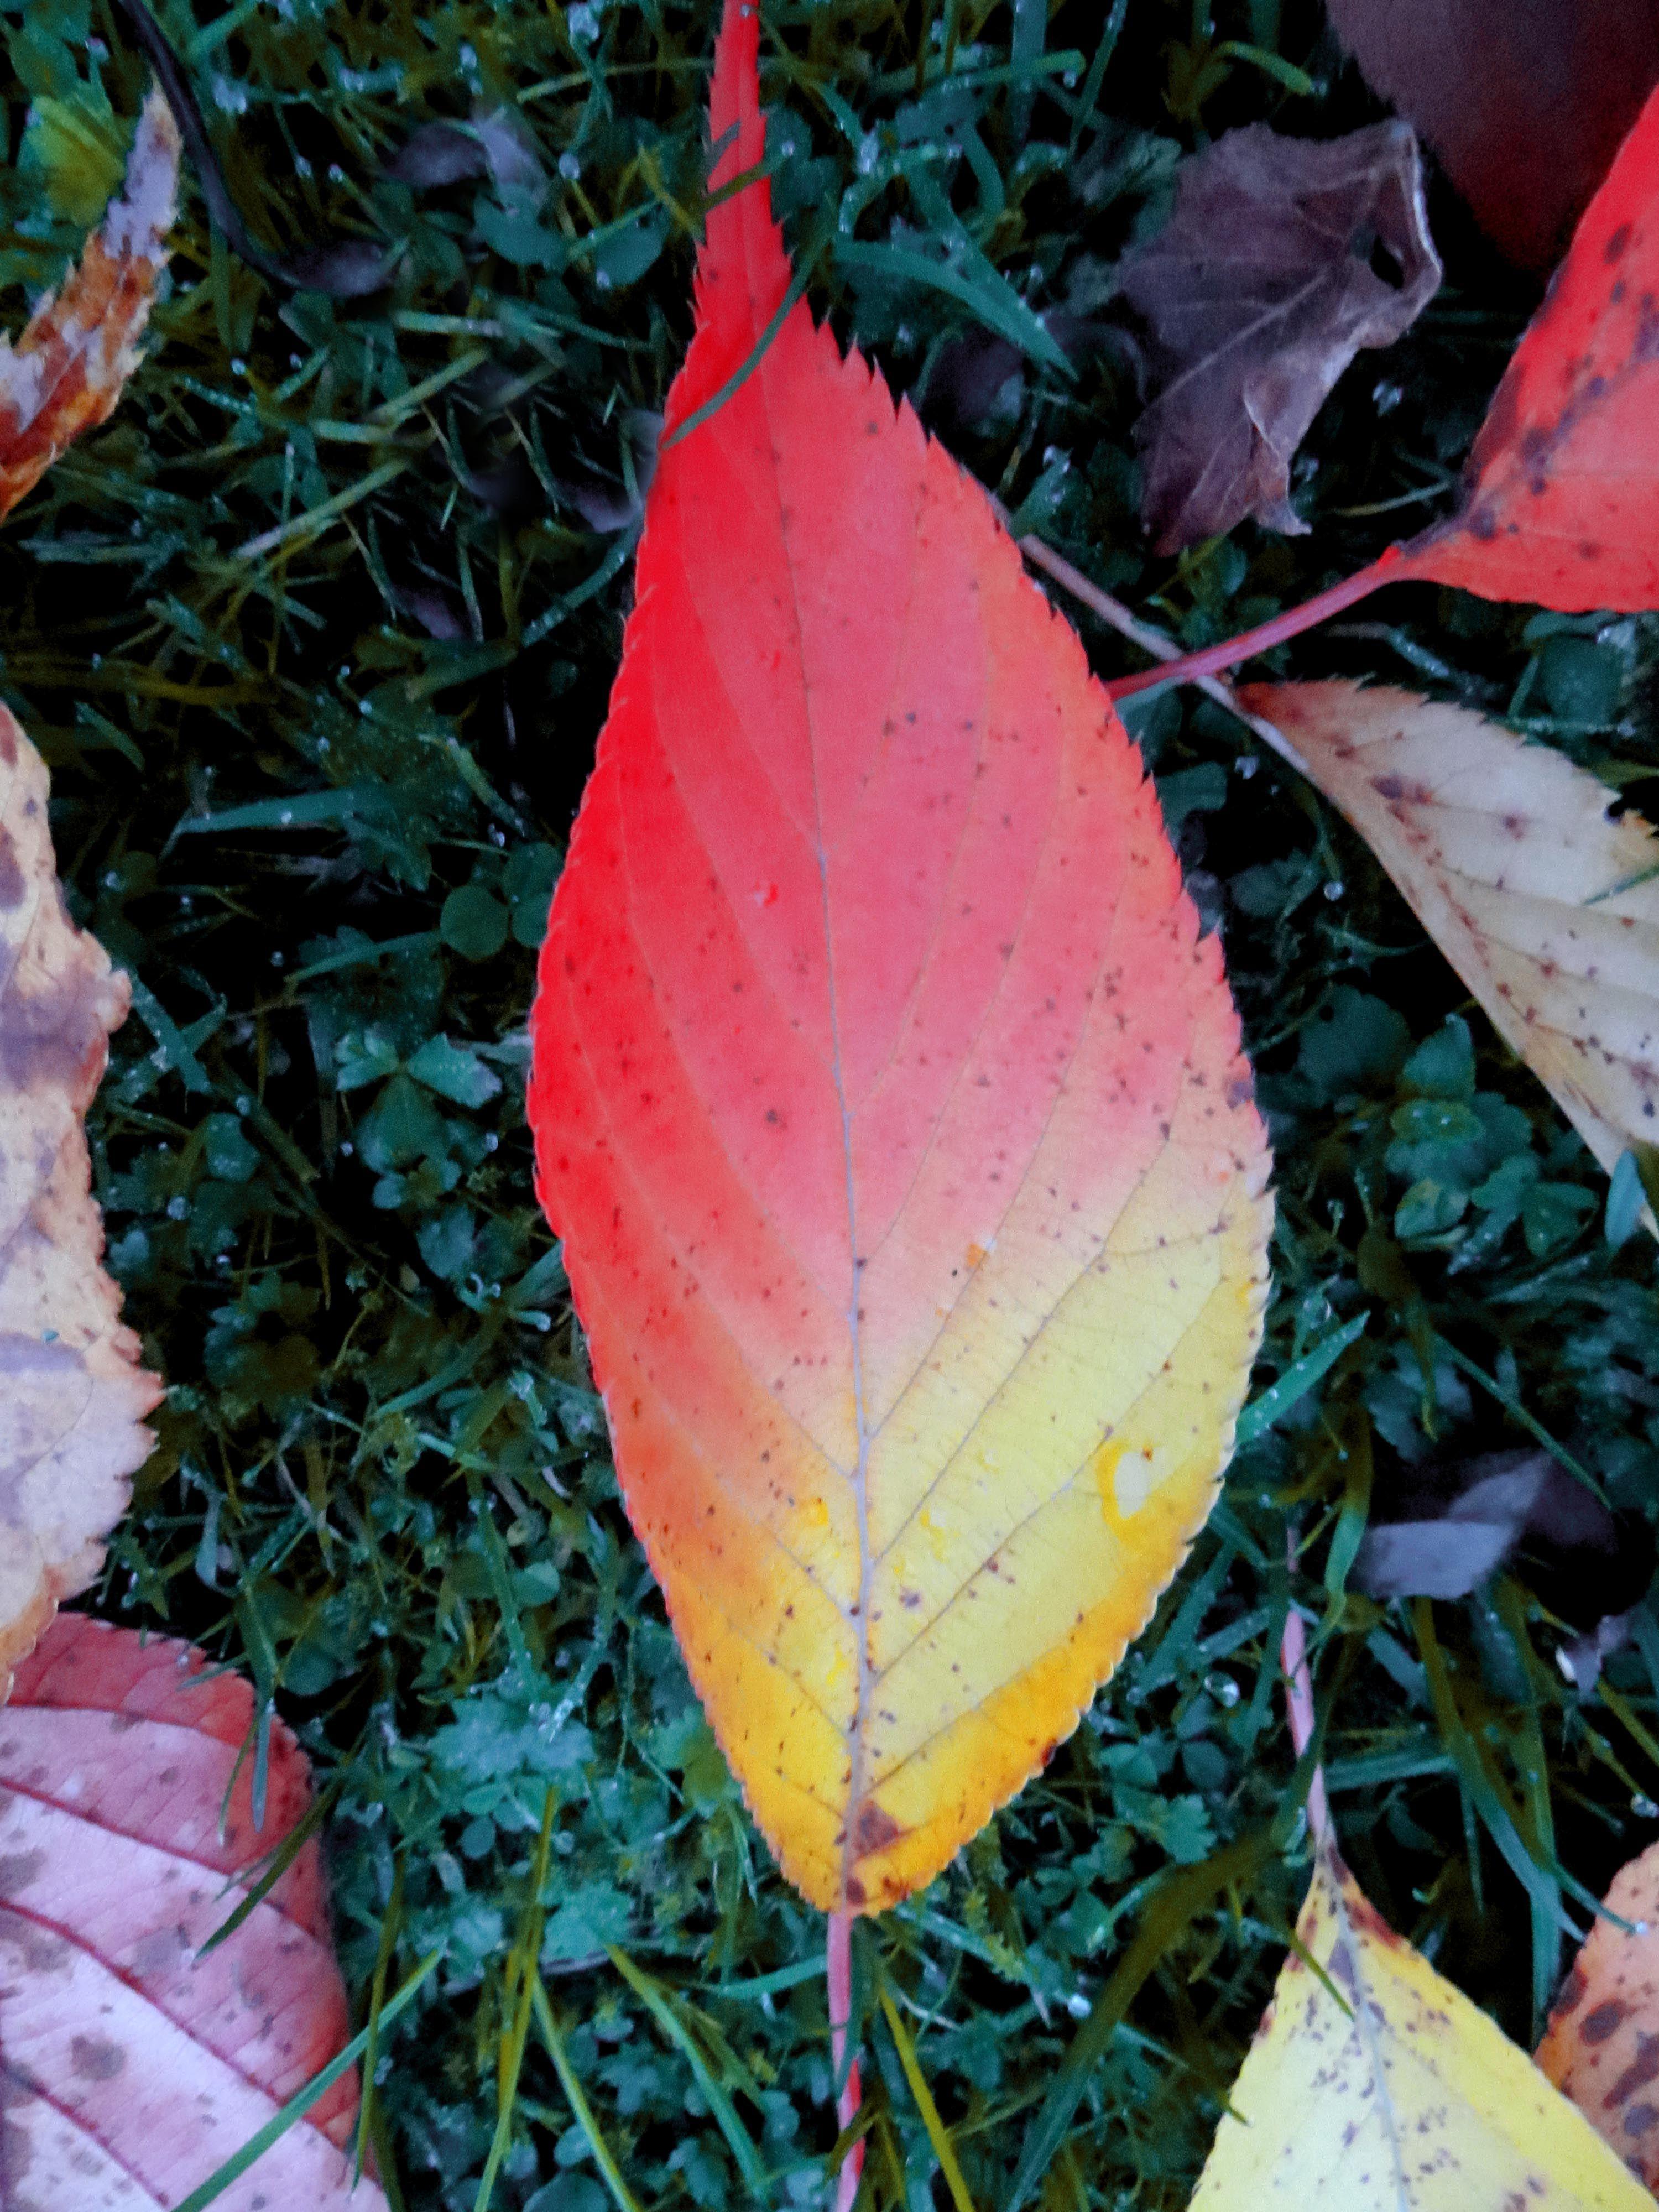 Flame leaf....a single cherry leaf